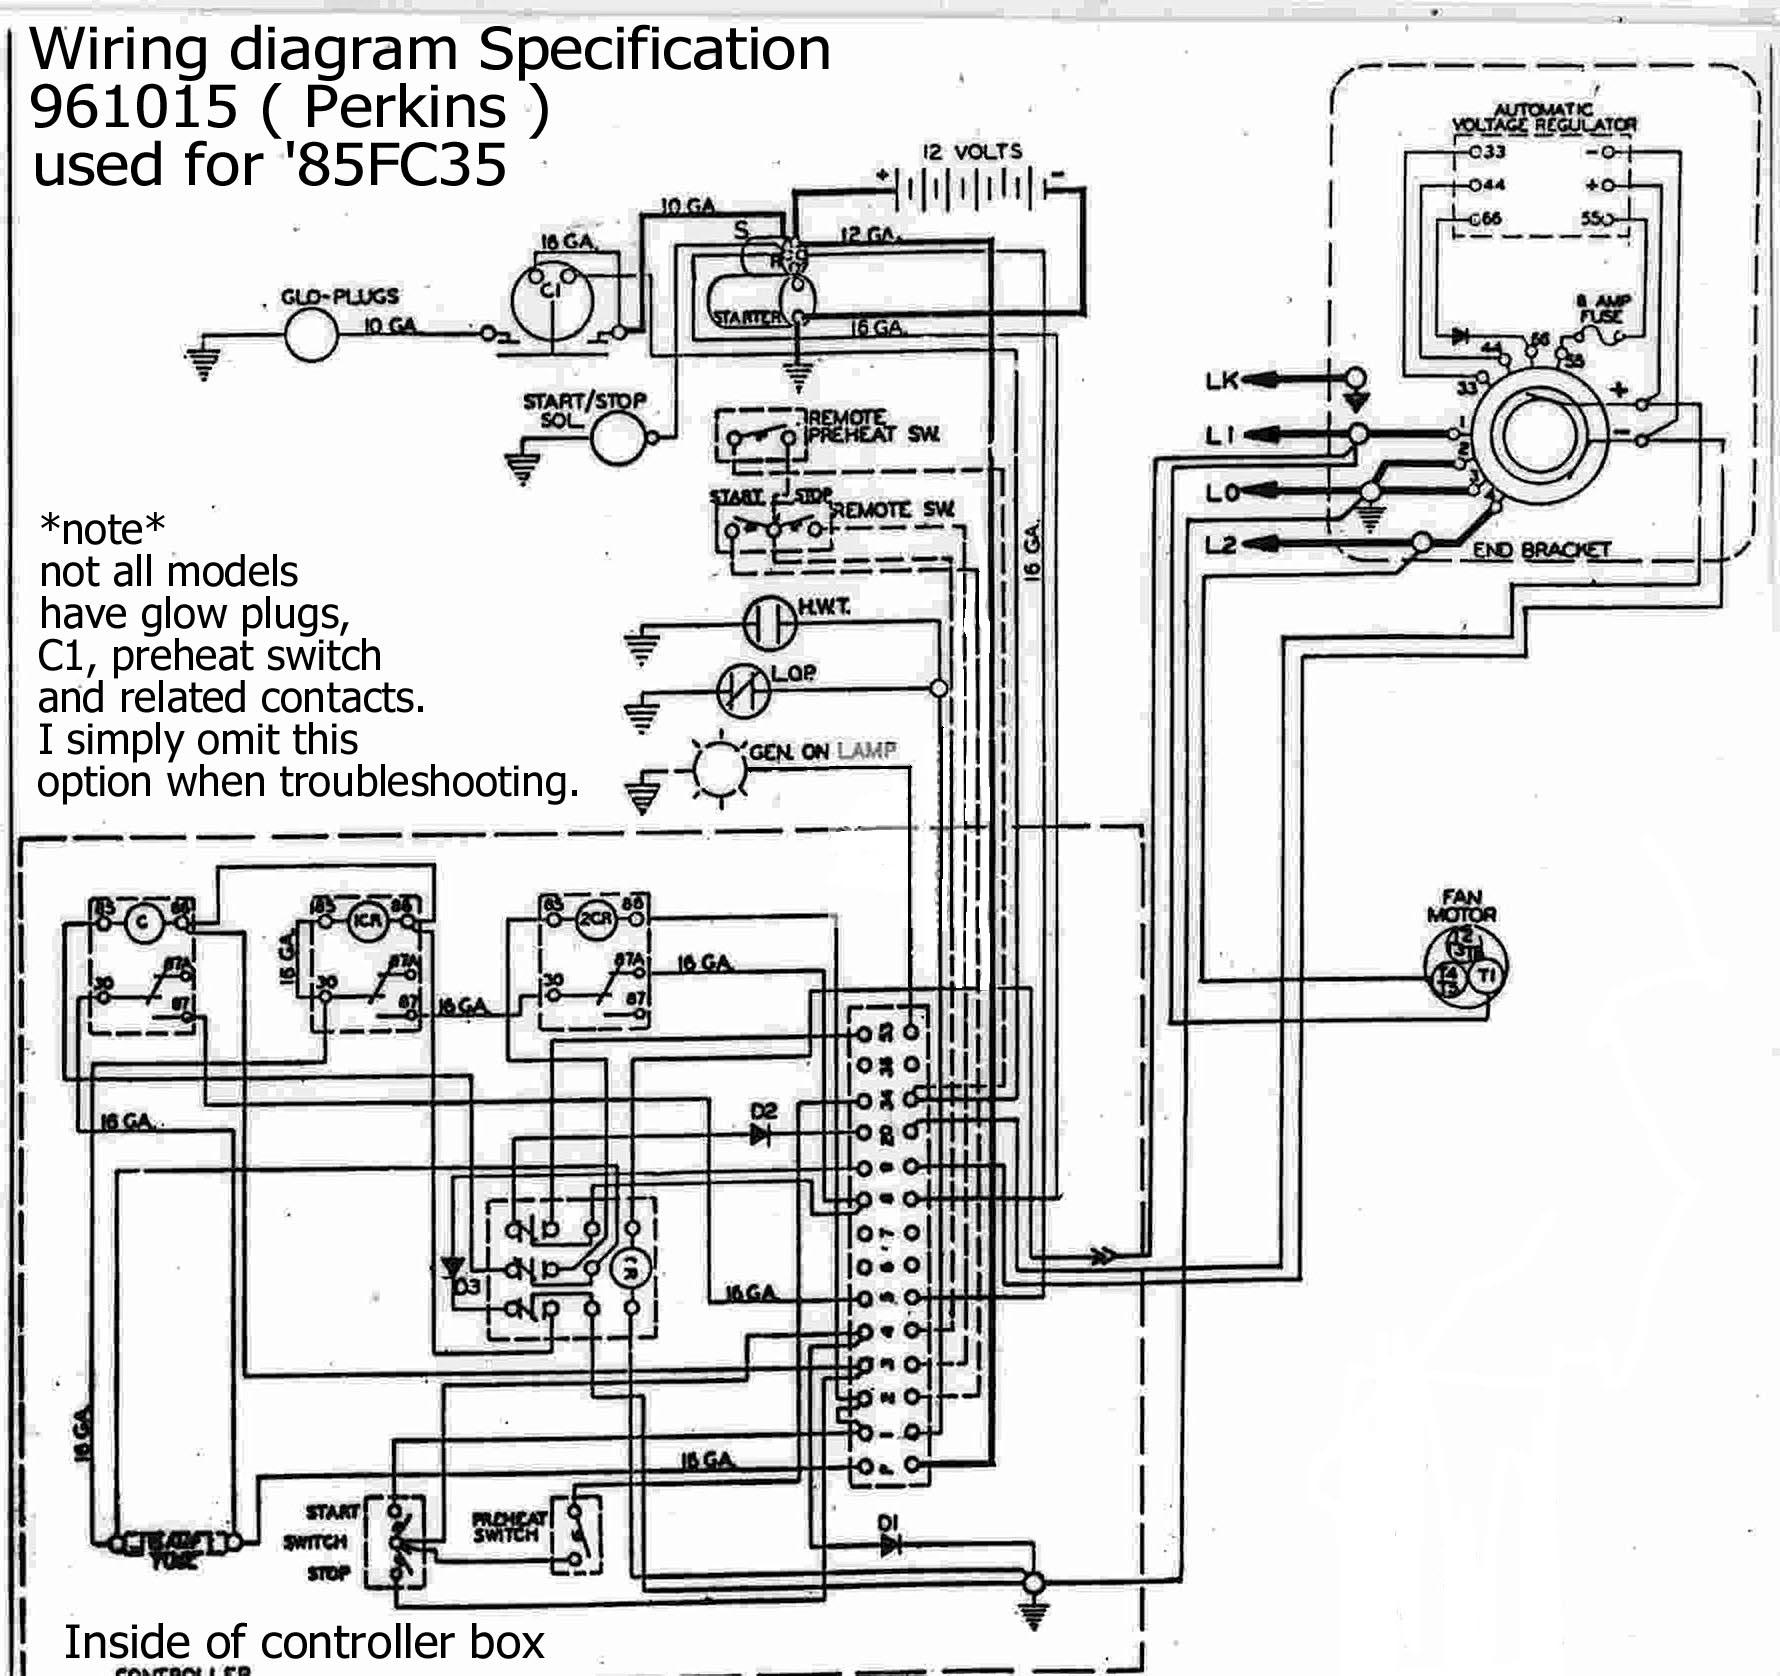 20kw generac generator wiring diagram wiring solutions charming portable generator wiring diagram pictures inspiration generator changeover switch wiring diagram australia cheapraybanclubmaster Images